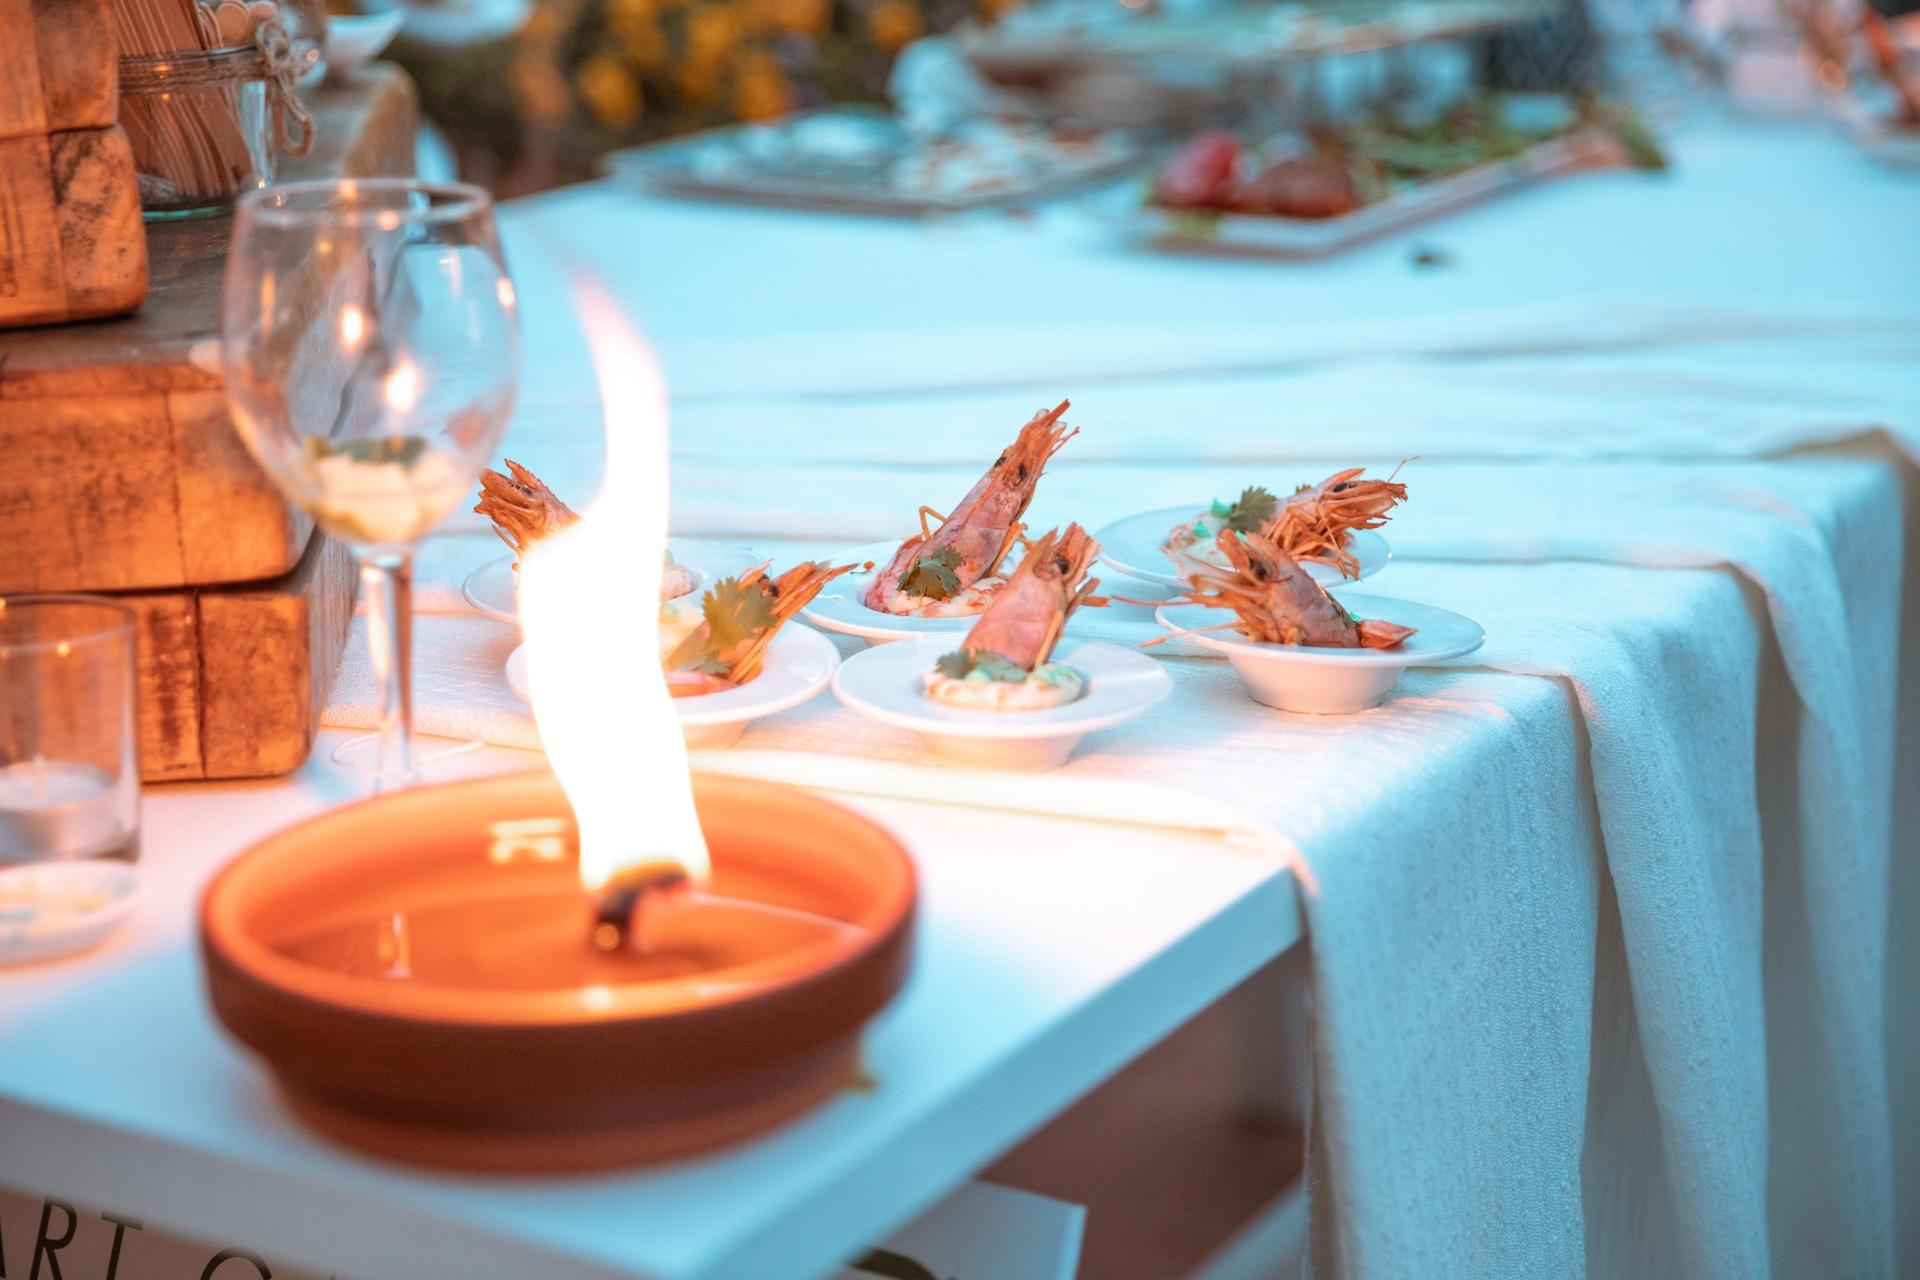 Vernissage PTCM – Tradizione culinaria